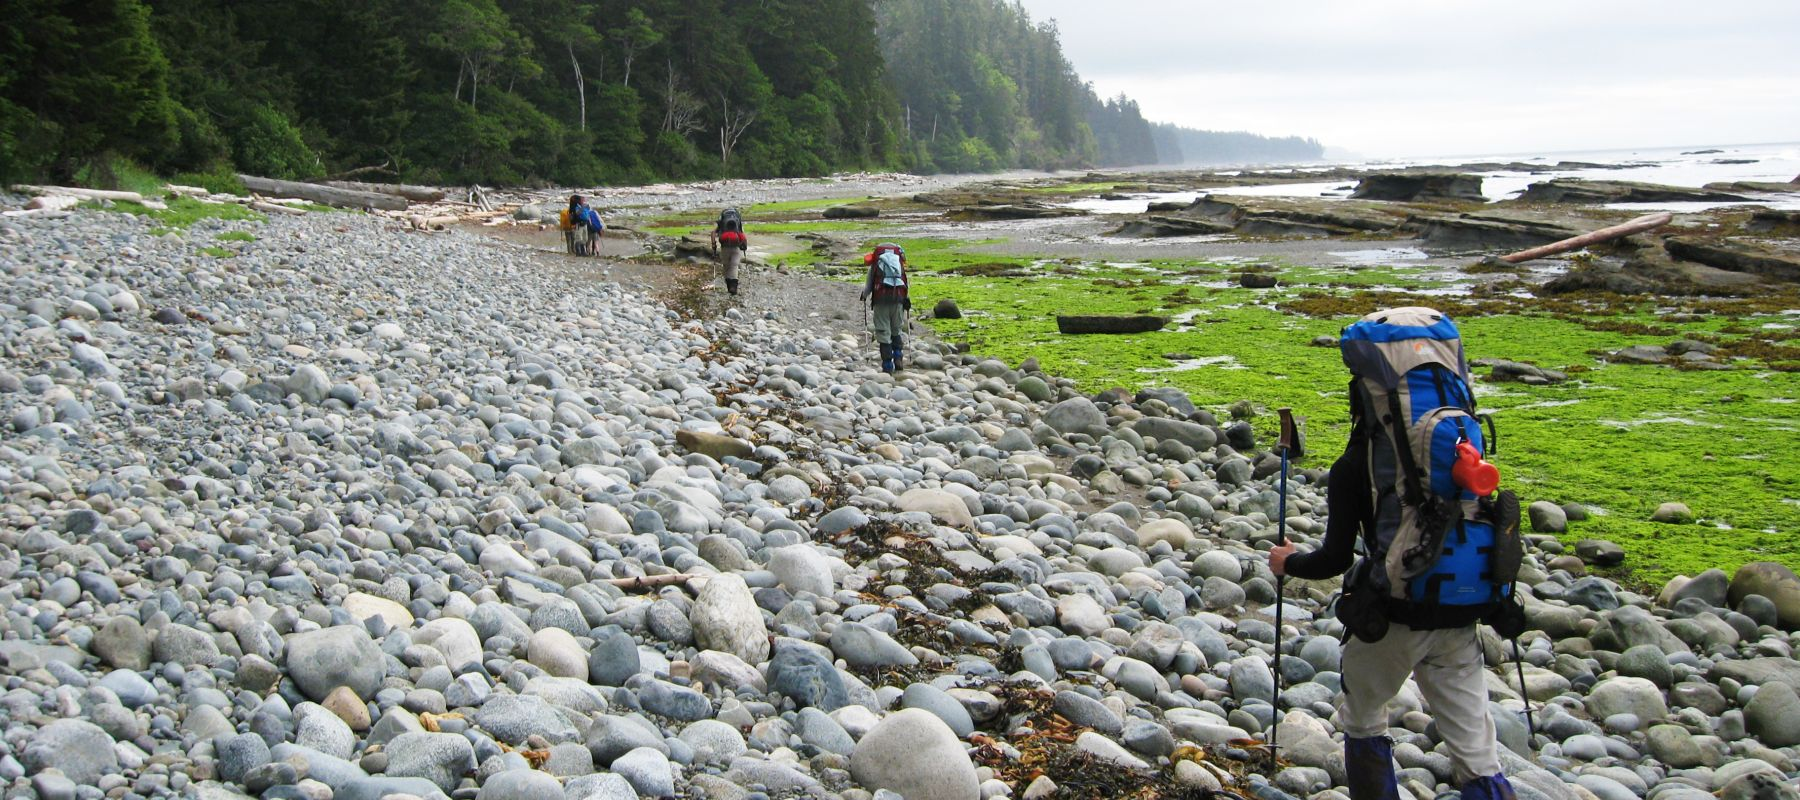 British Columbia Trekking Adventure: Hike The West Coast Trail